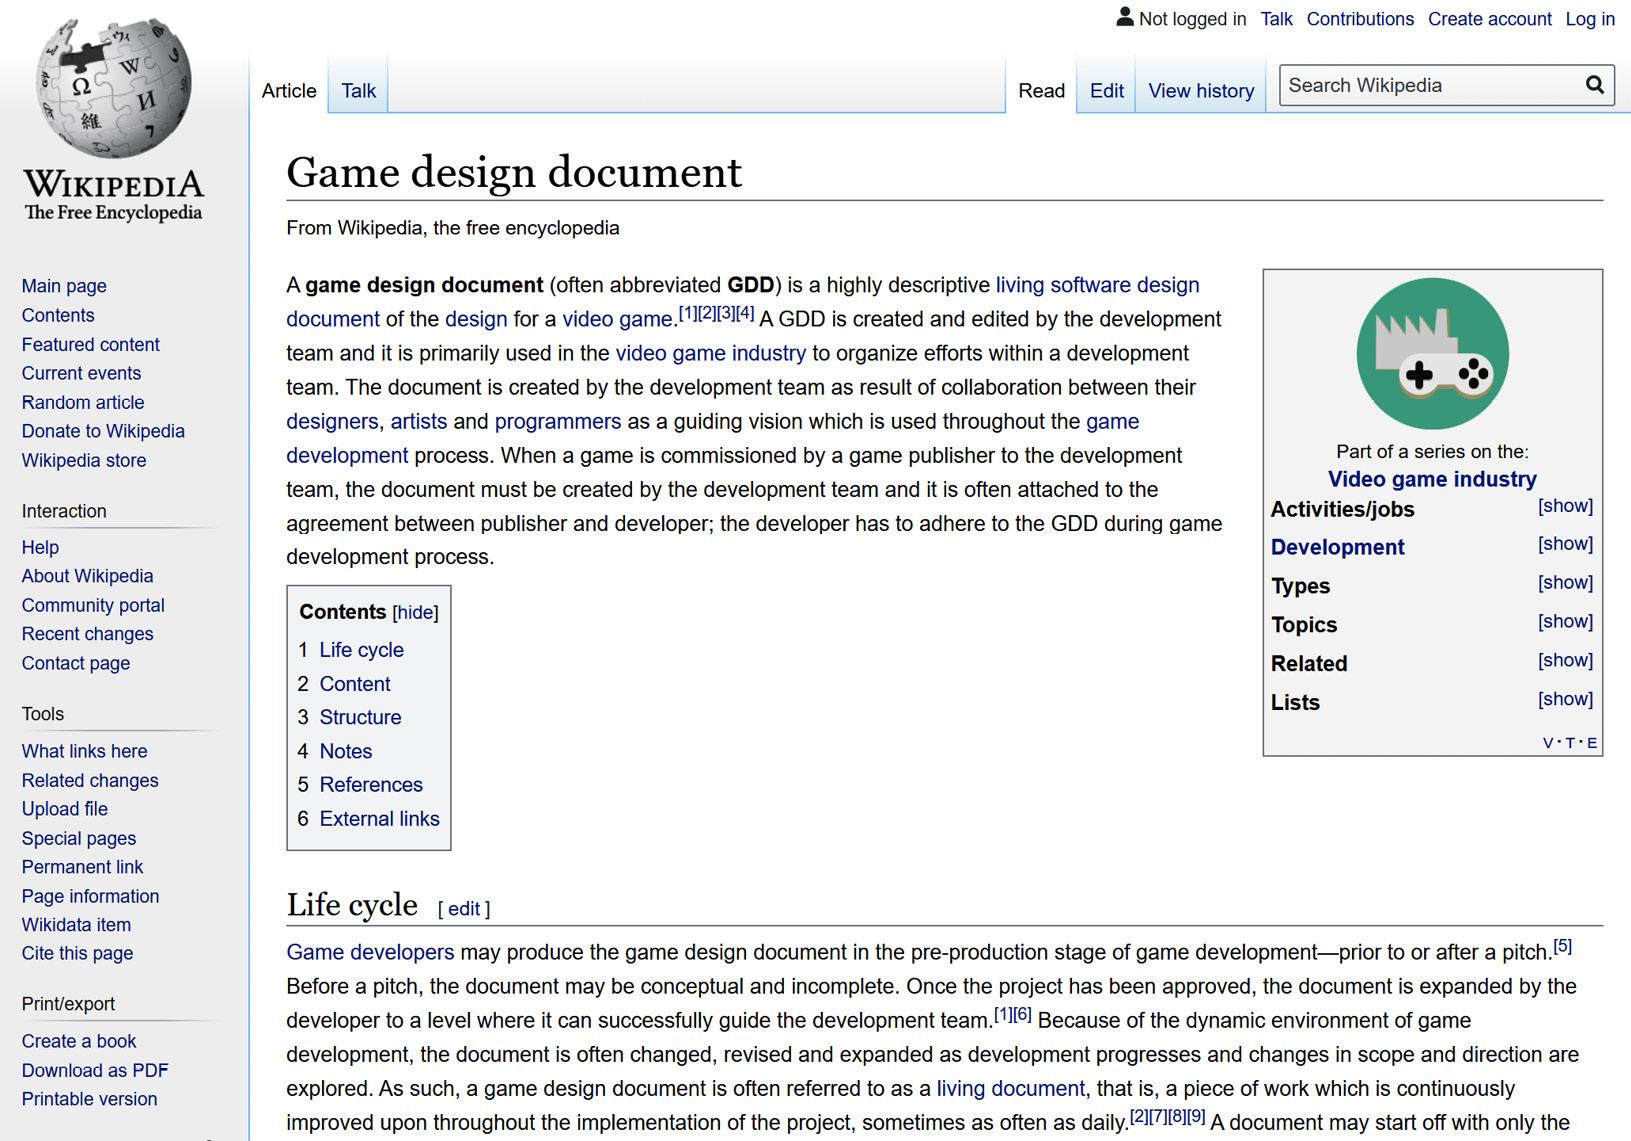 Figure 1.8 – Wikipedia site